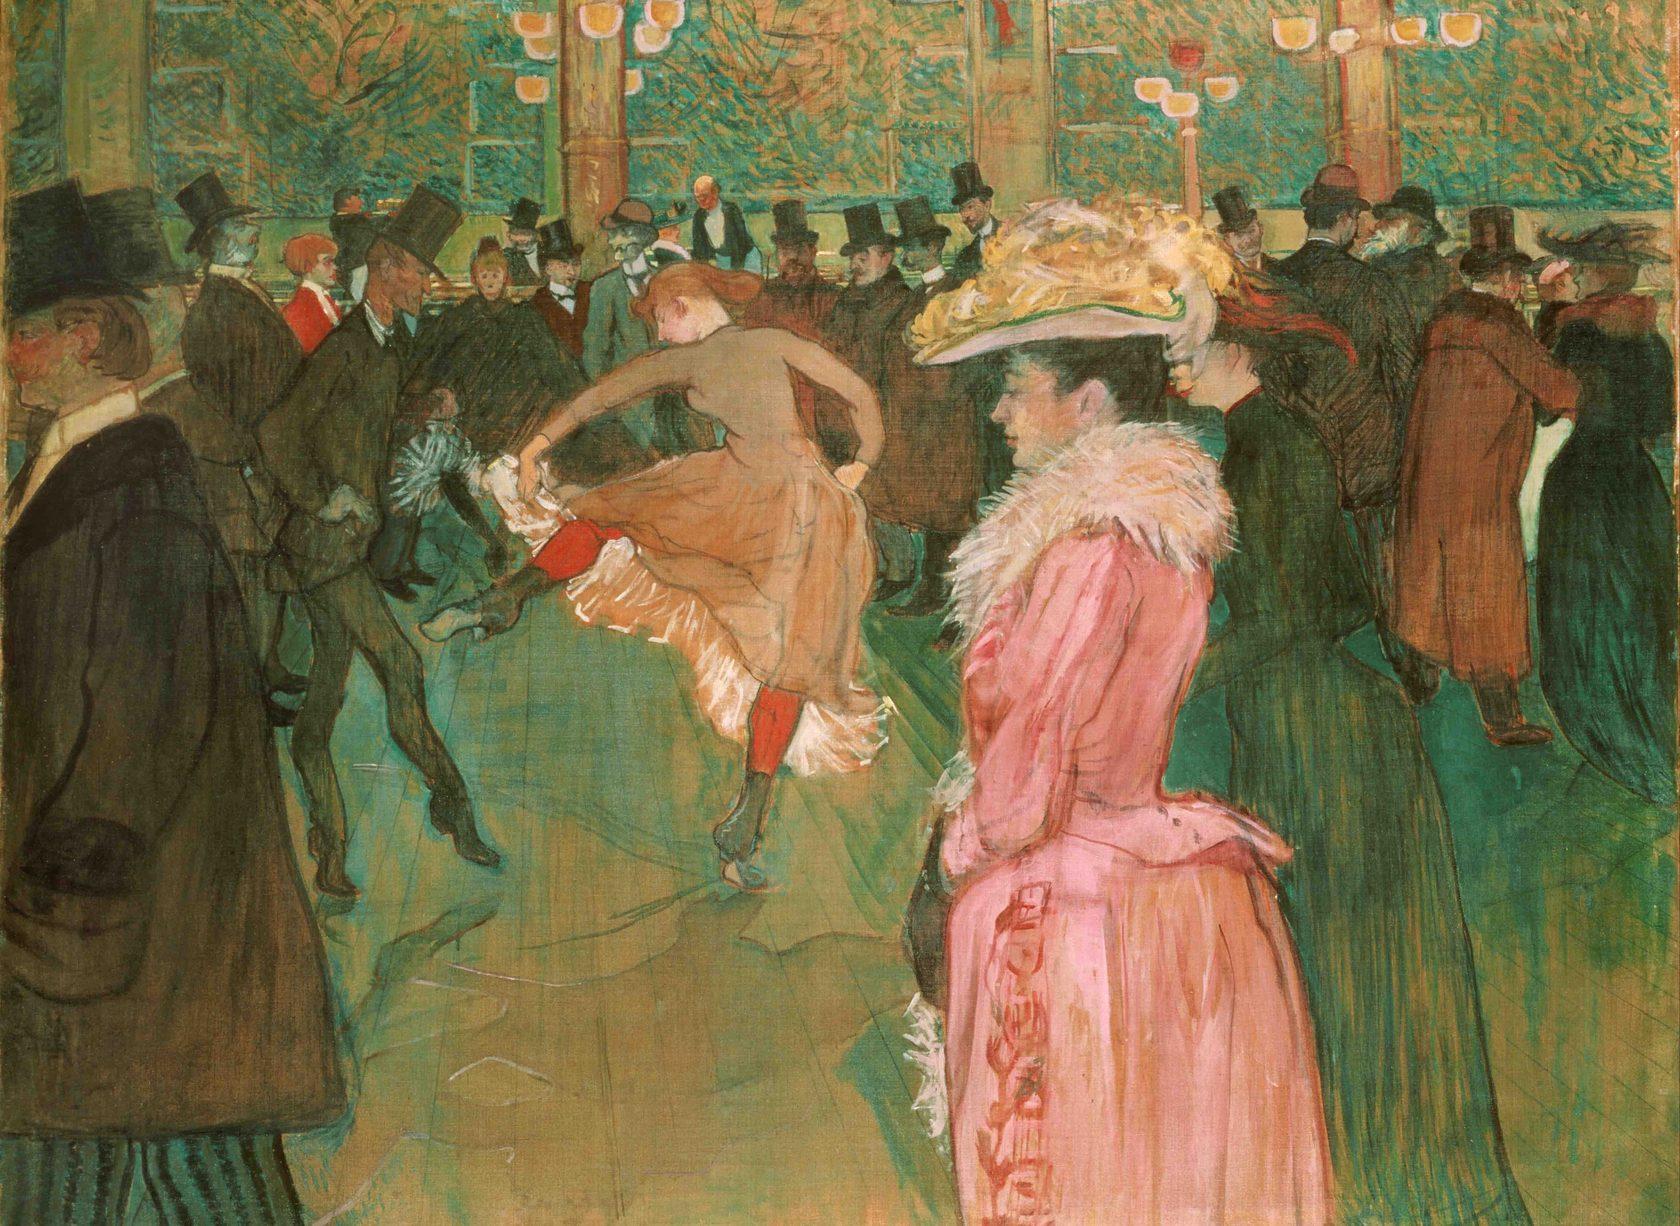 Анри Тулуз-Лотрека, Мулен Руже, картина — Танец, 1890 год